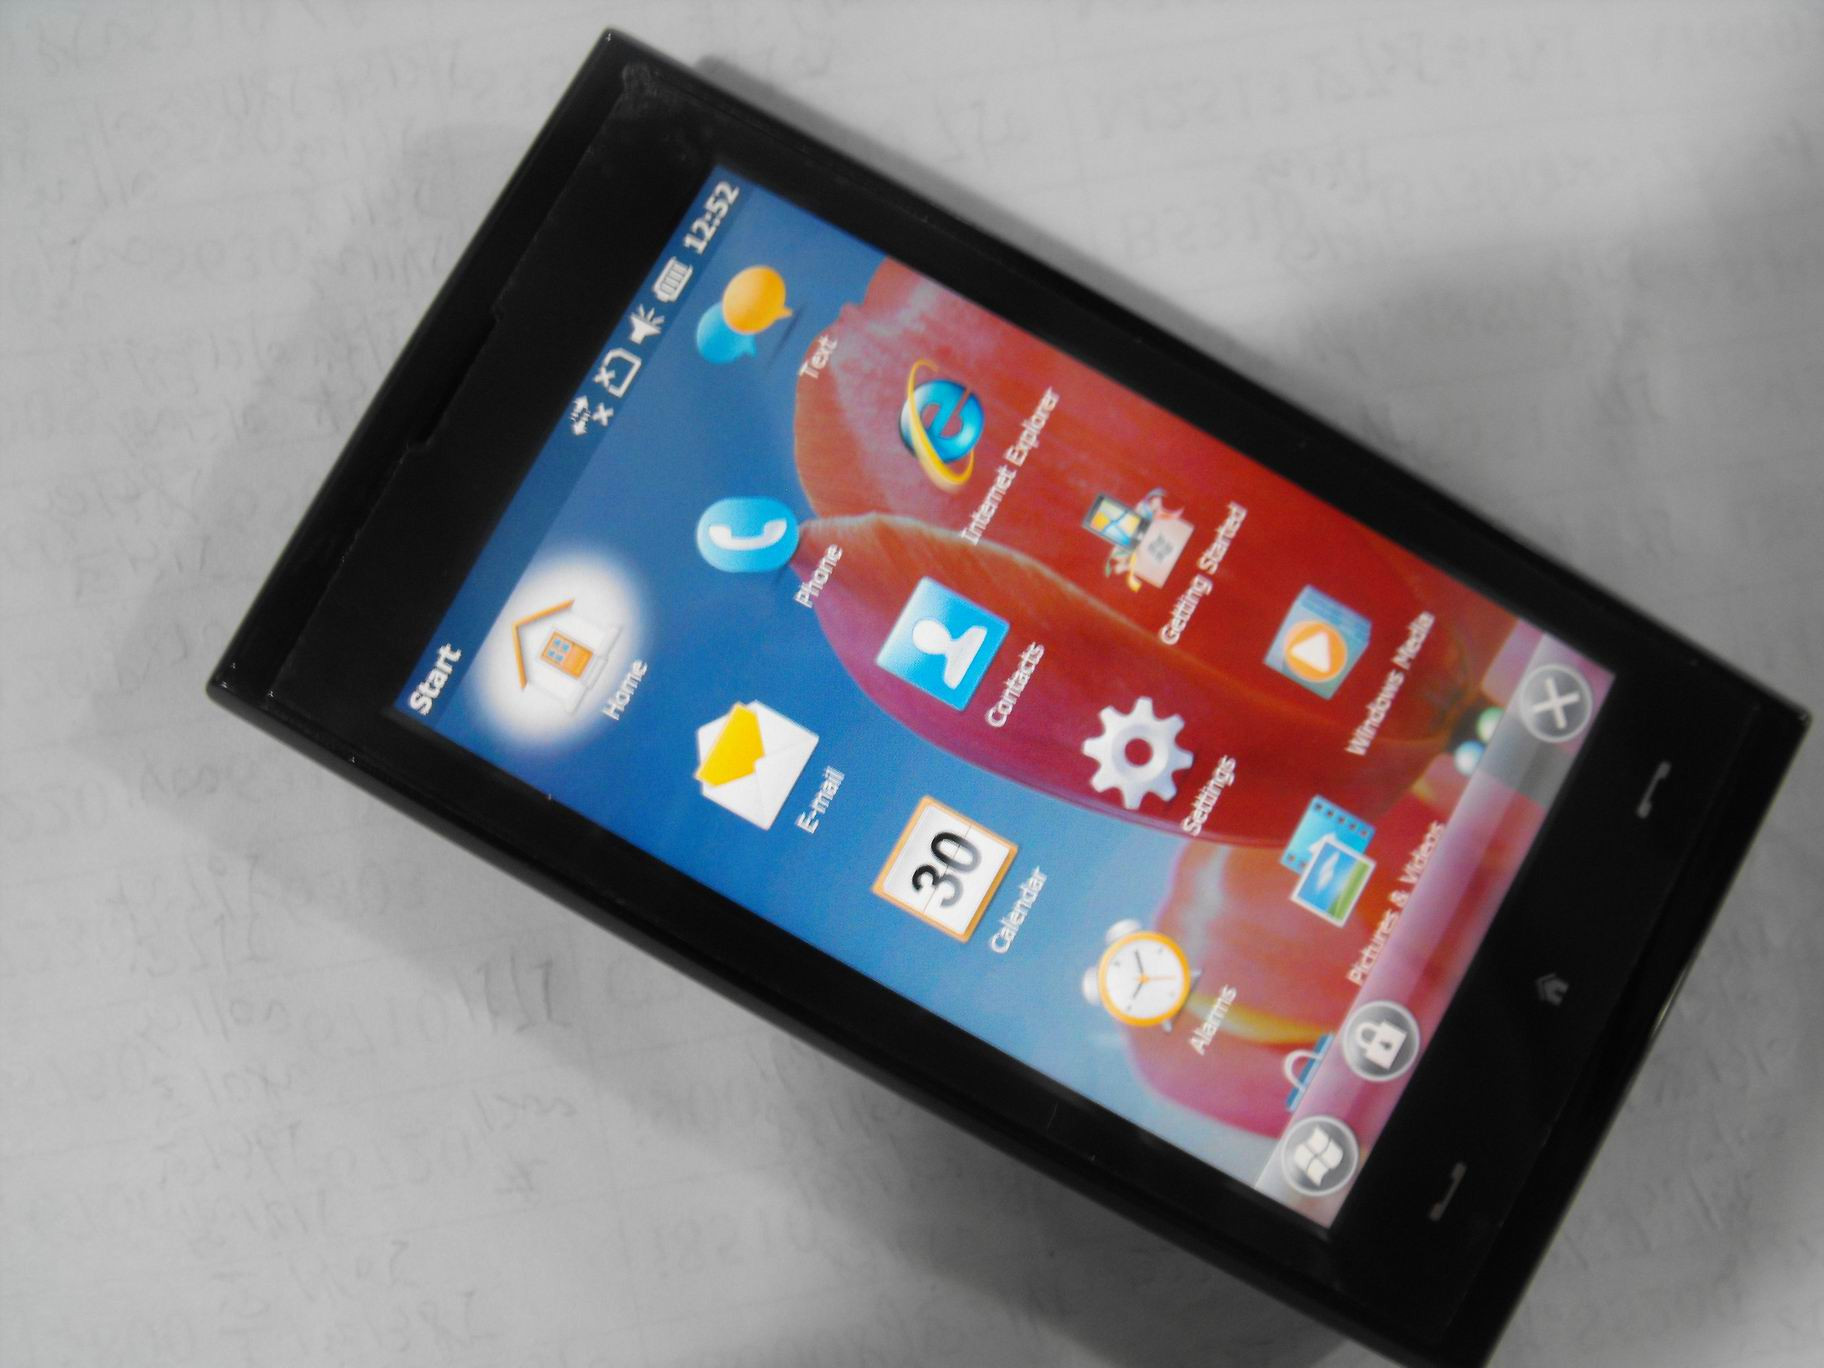 1354750897_htc-max-4g-smart-phone.jpg